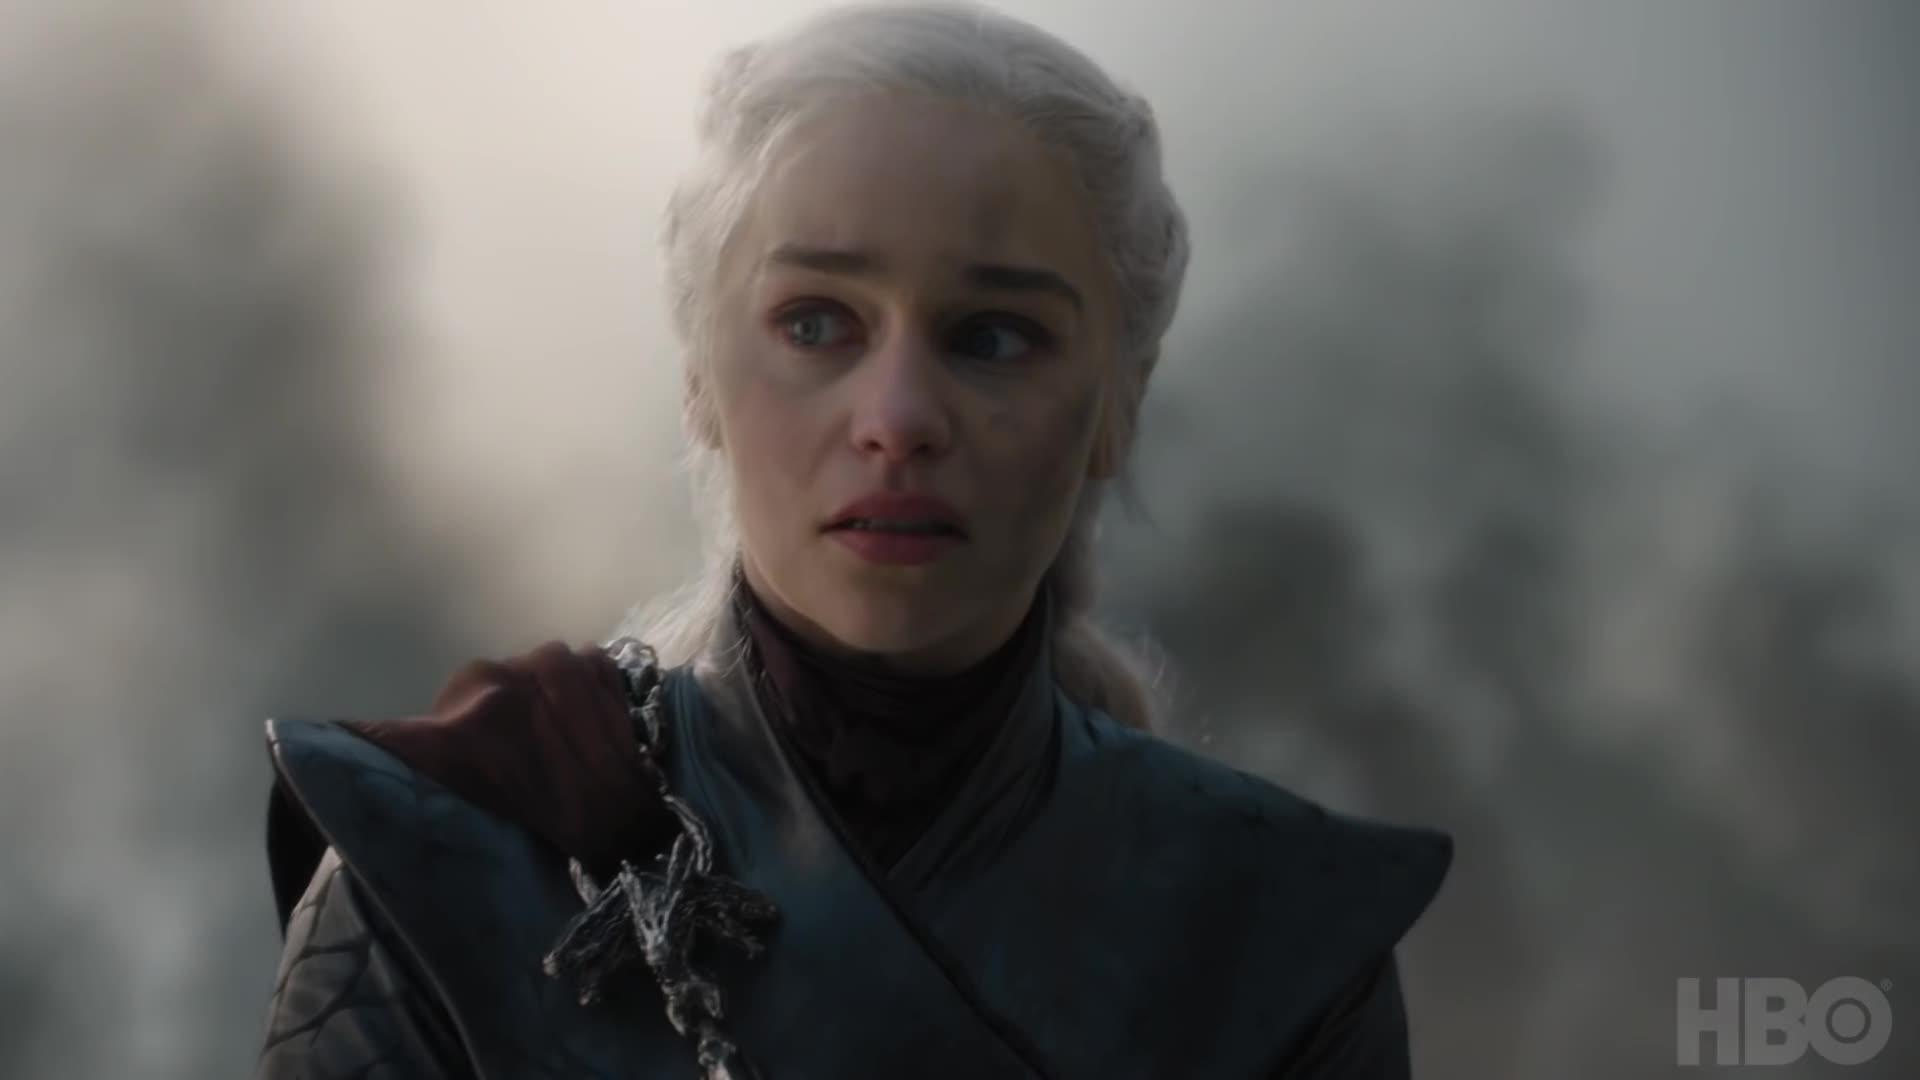 daenerys targaryen, emilia clarke, final season, game of thrones, gameofthrones, got, hbo, lannister, season 8, stark, Daenerys Cracks Game of Thrones | Season 8 Episode 5 GIFs